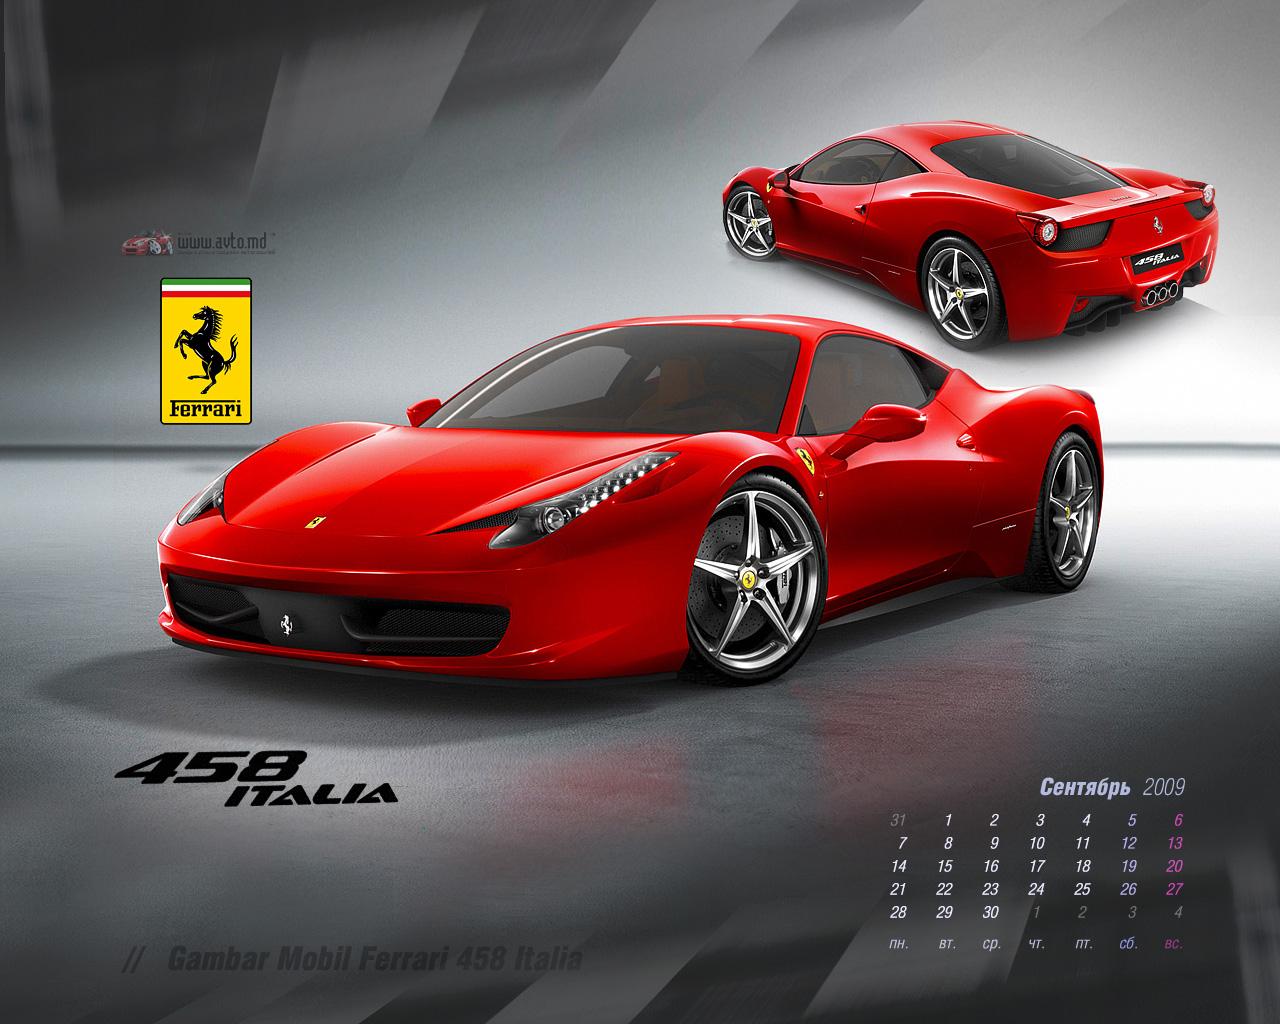 Wallpaper Mobil Sport Ferrari: Wallpapers Mobil Ferrari (40 Wallpapers)